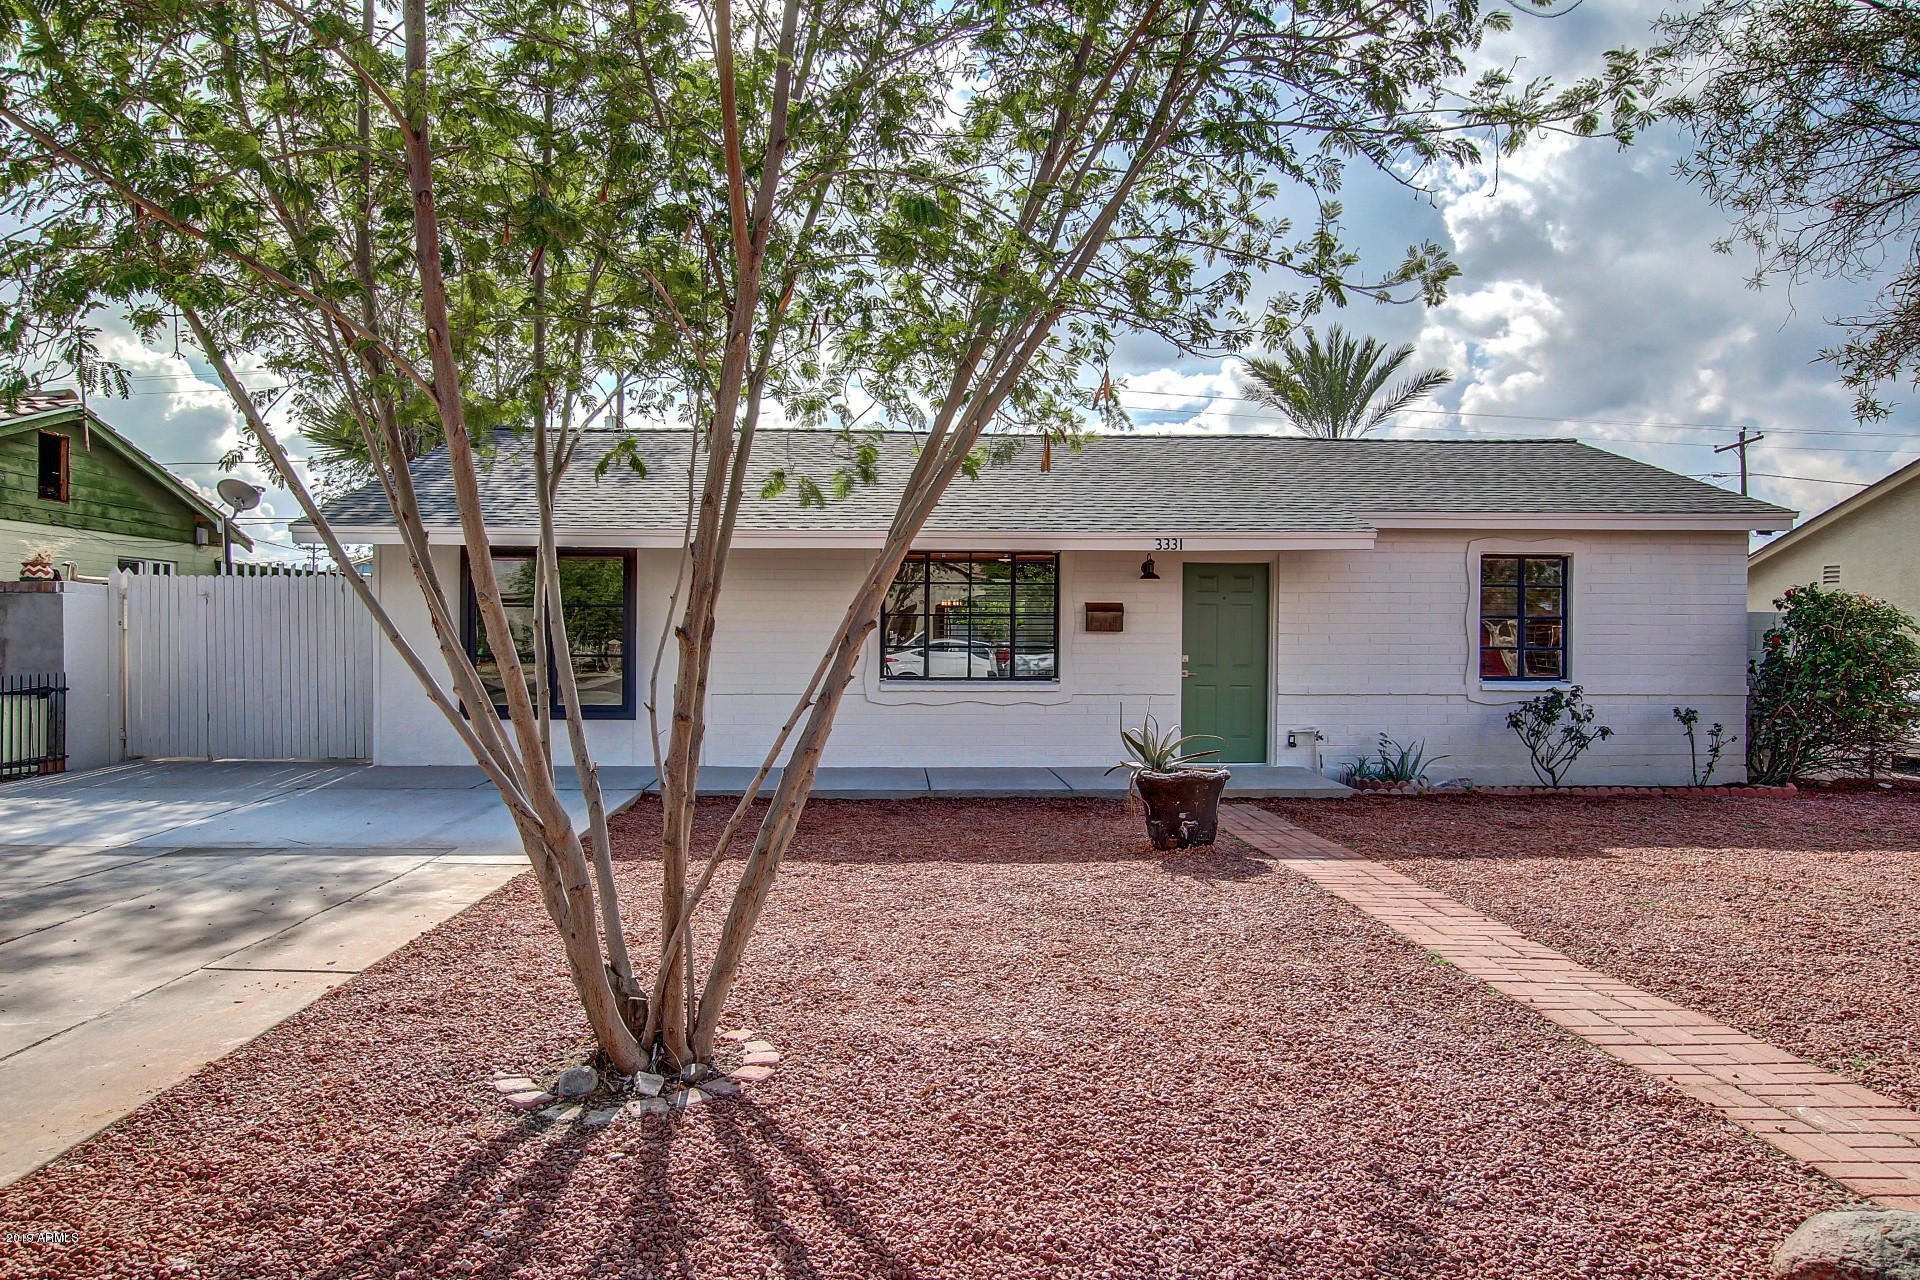 Photo of 3331 E HARVARD Street, Phoenix, AZ 85008